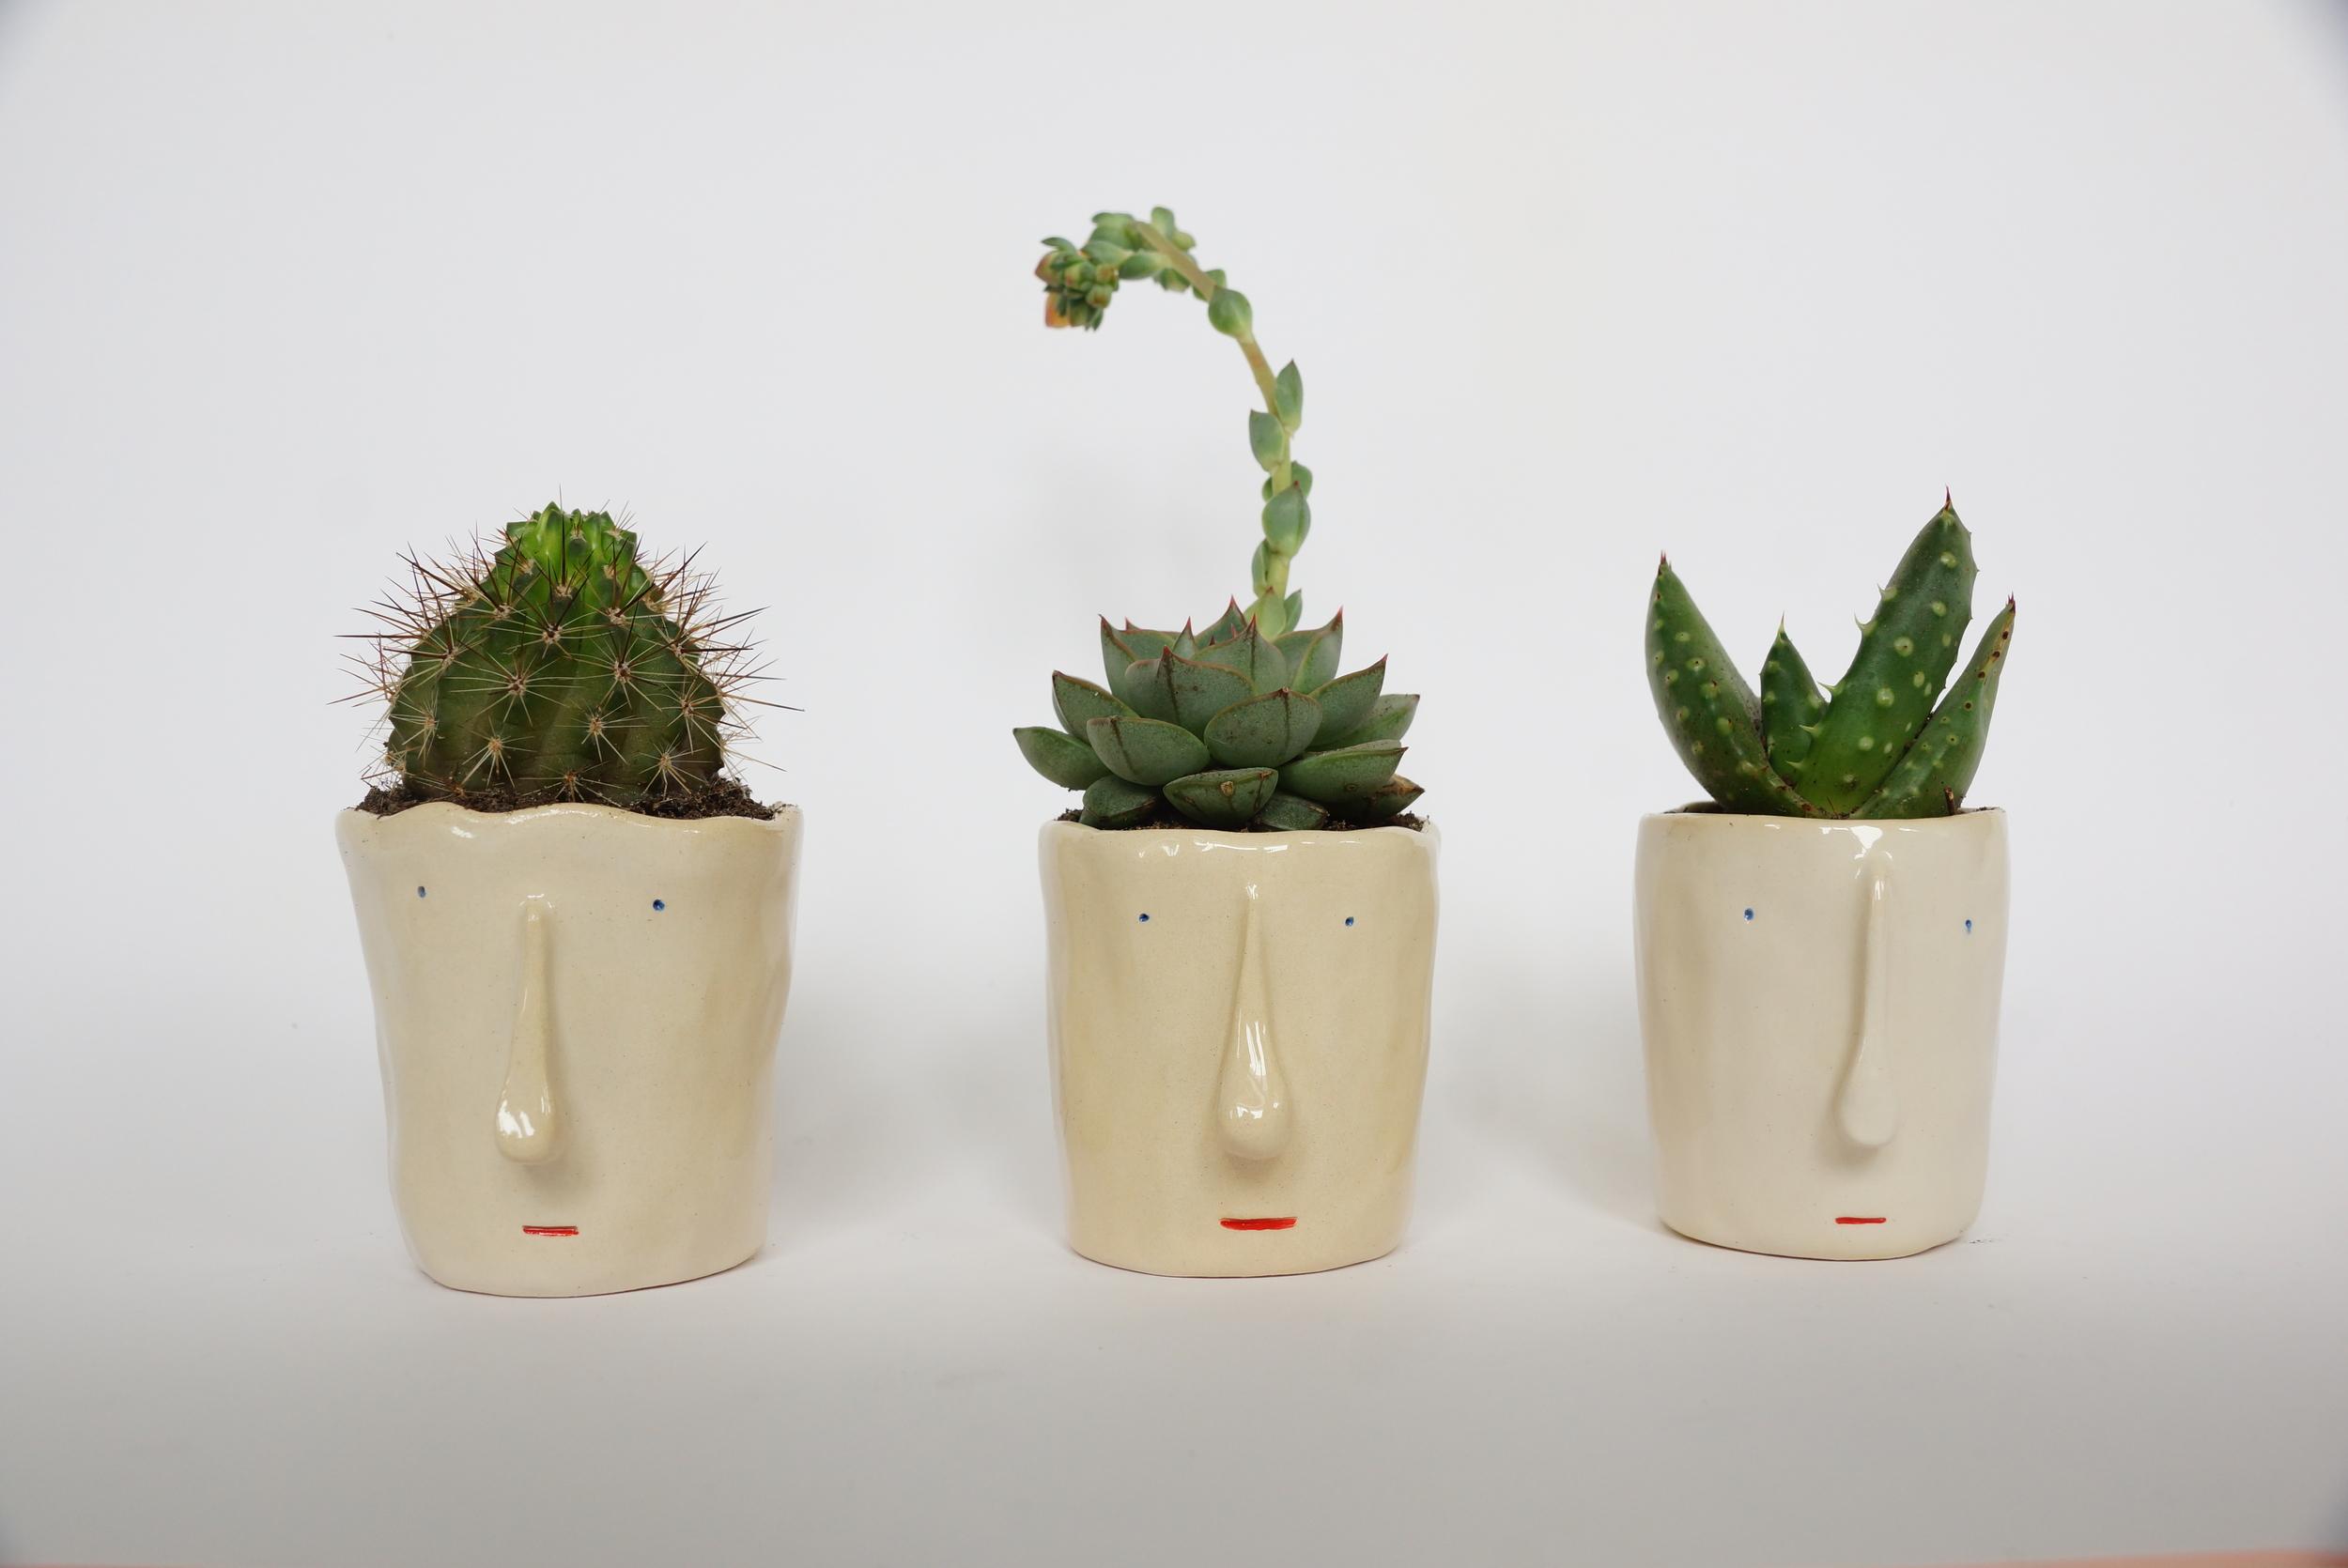 pompilio-plants-testos-plantes-cares.JPG